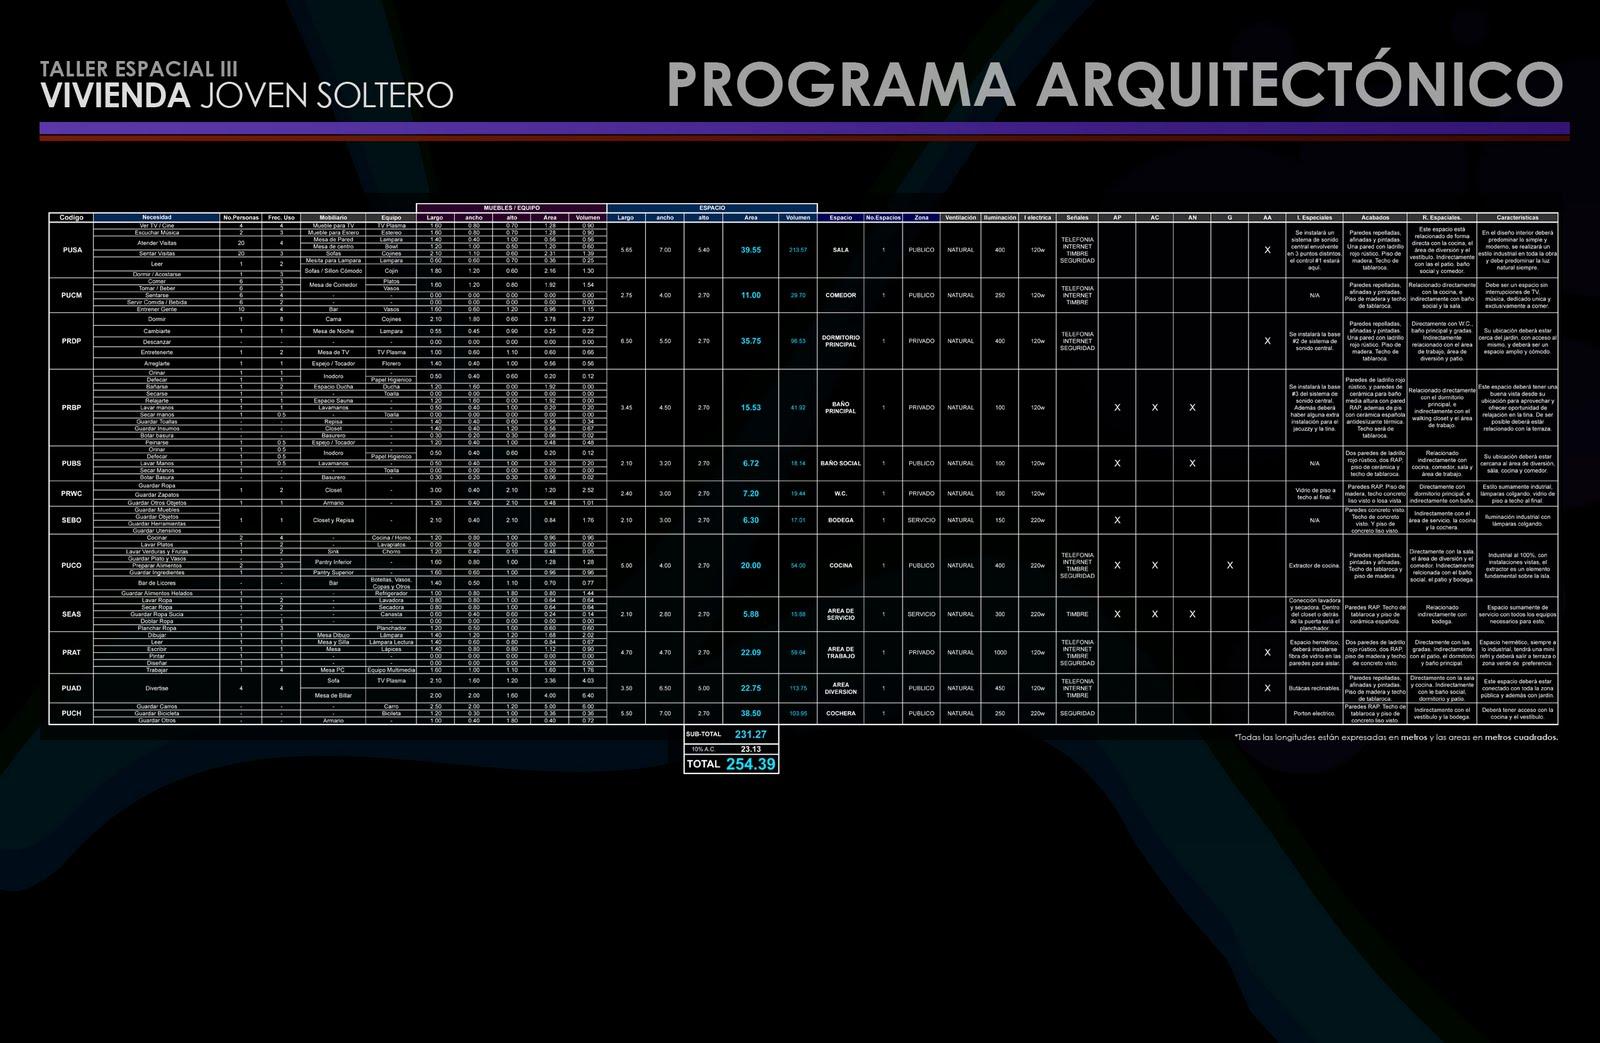 Lab2usach2011 programa arquitectonico for Programa arquitectonico biblioteca